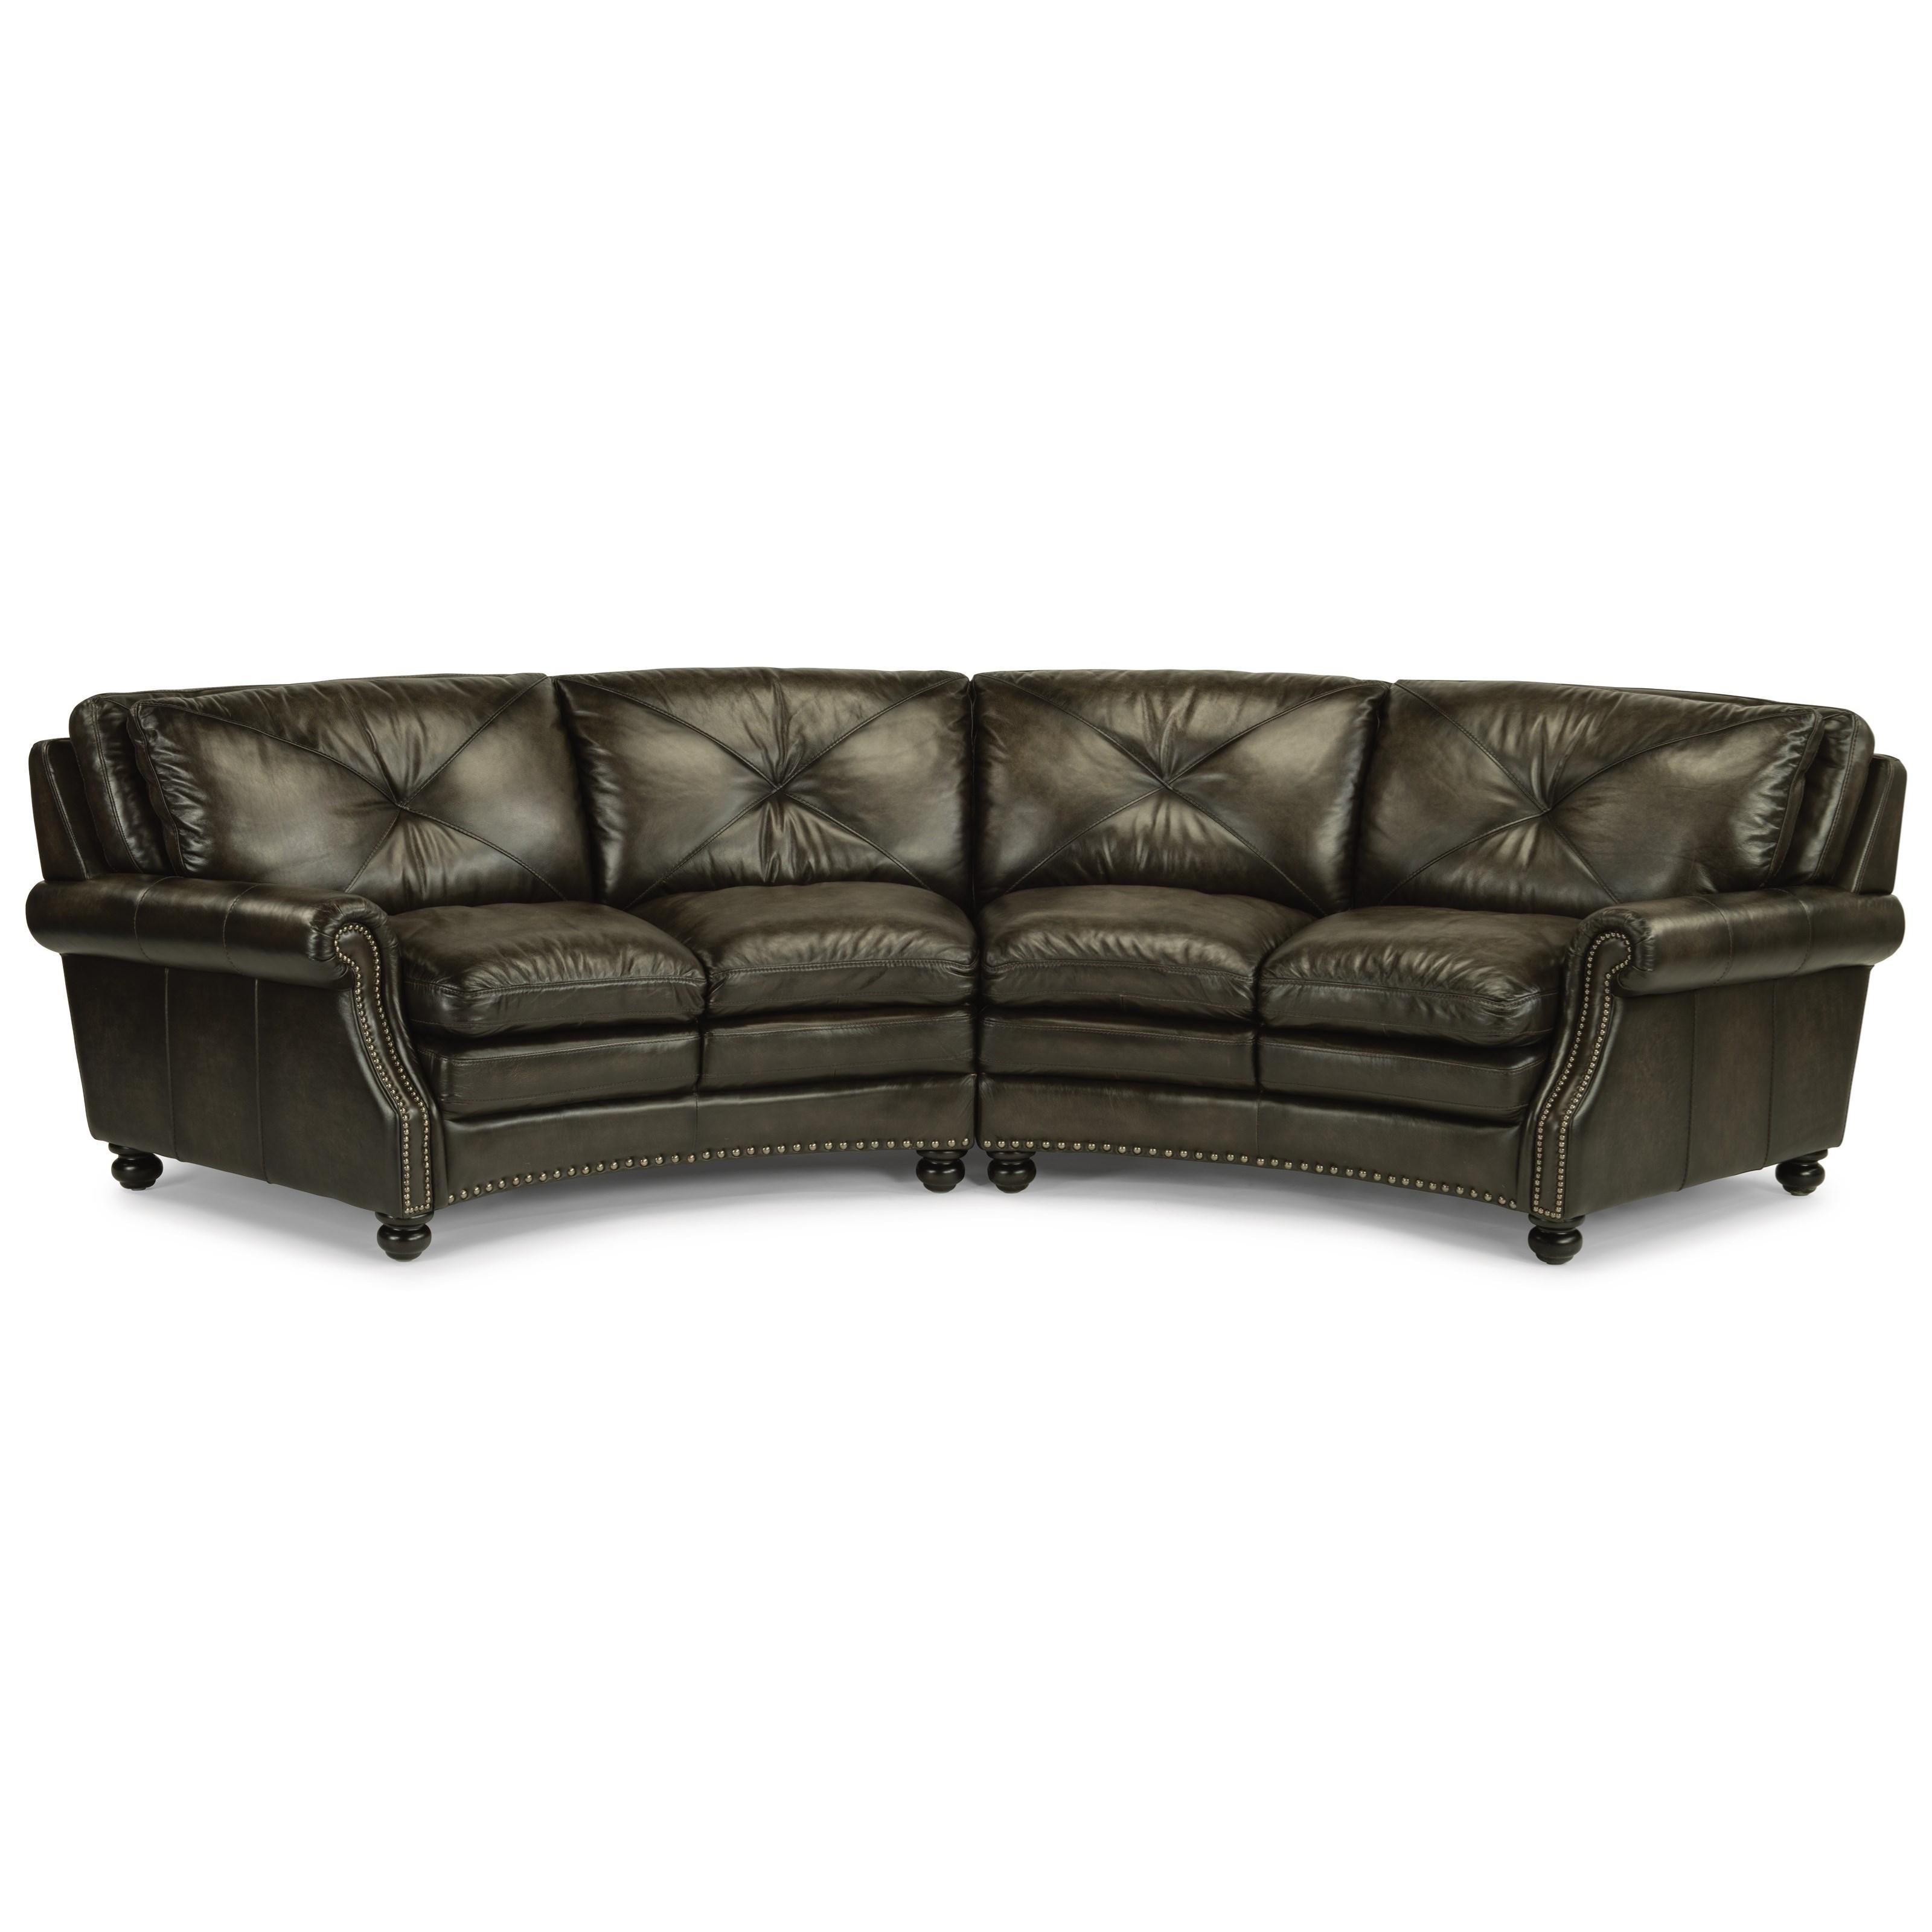 Merveilleux Flexsteel Latitudes Suffolk Round Sectional Sofa With Nailhead Trim